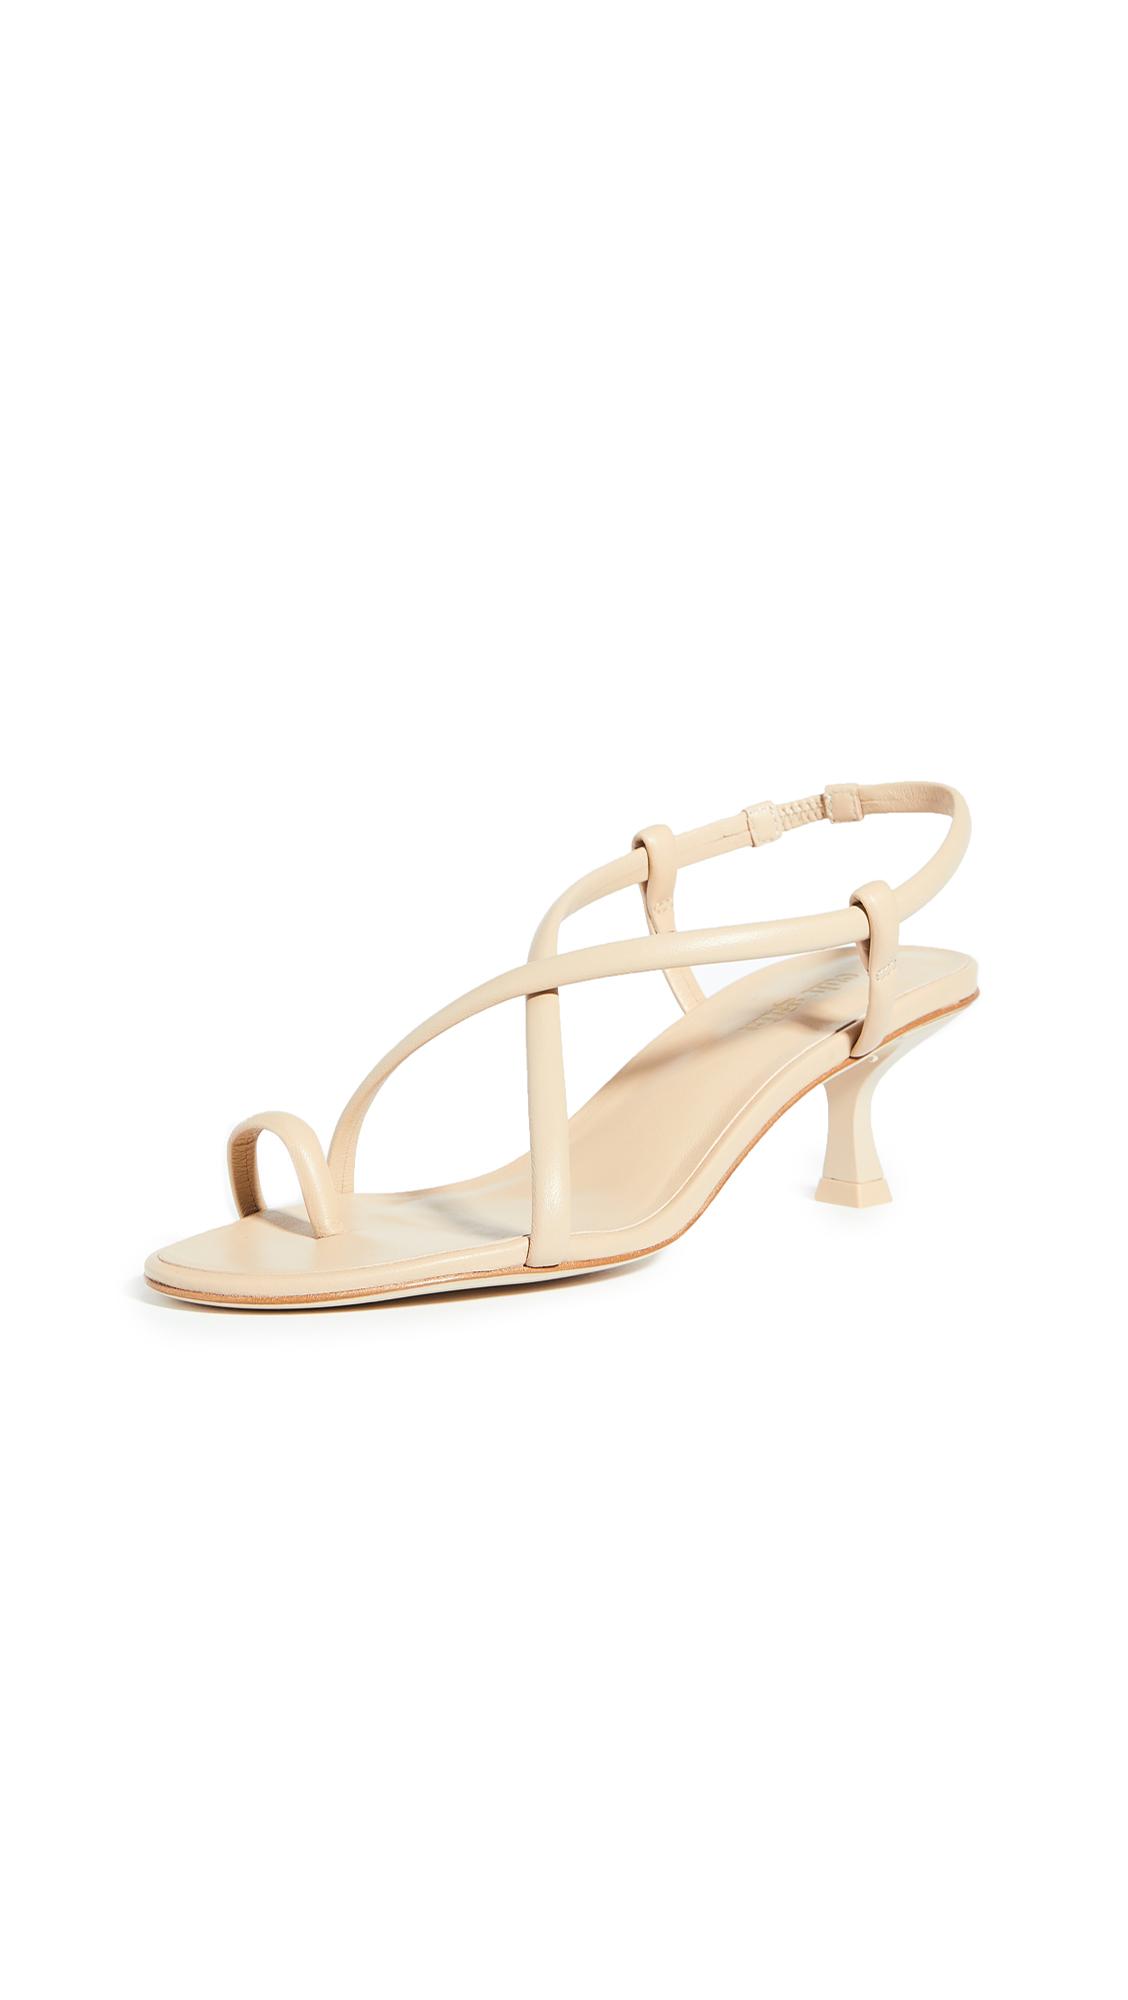 Buy Cult Gaia Sandee Sandals online, shop Cult Gaia